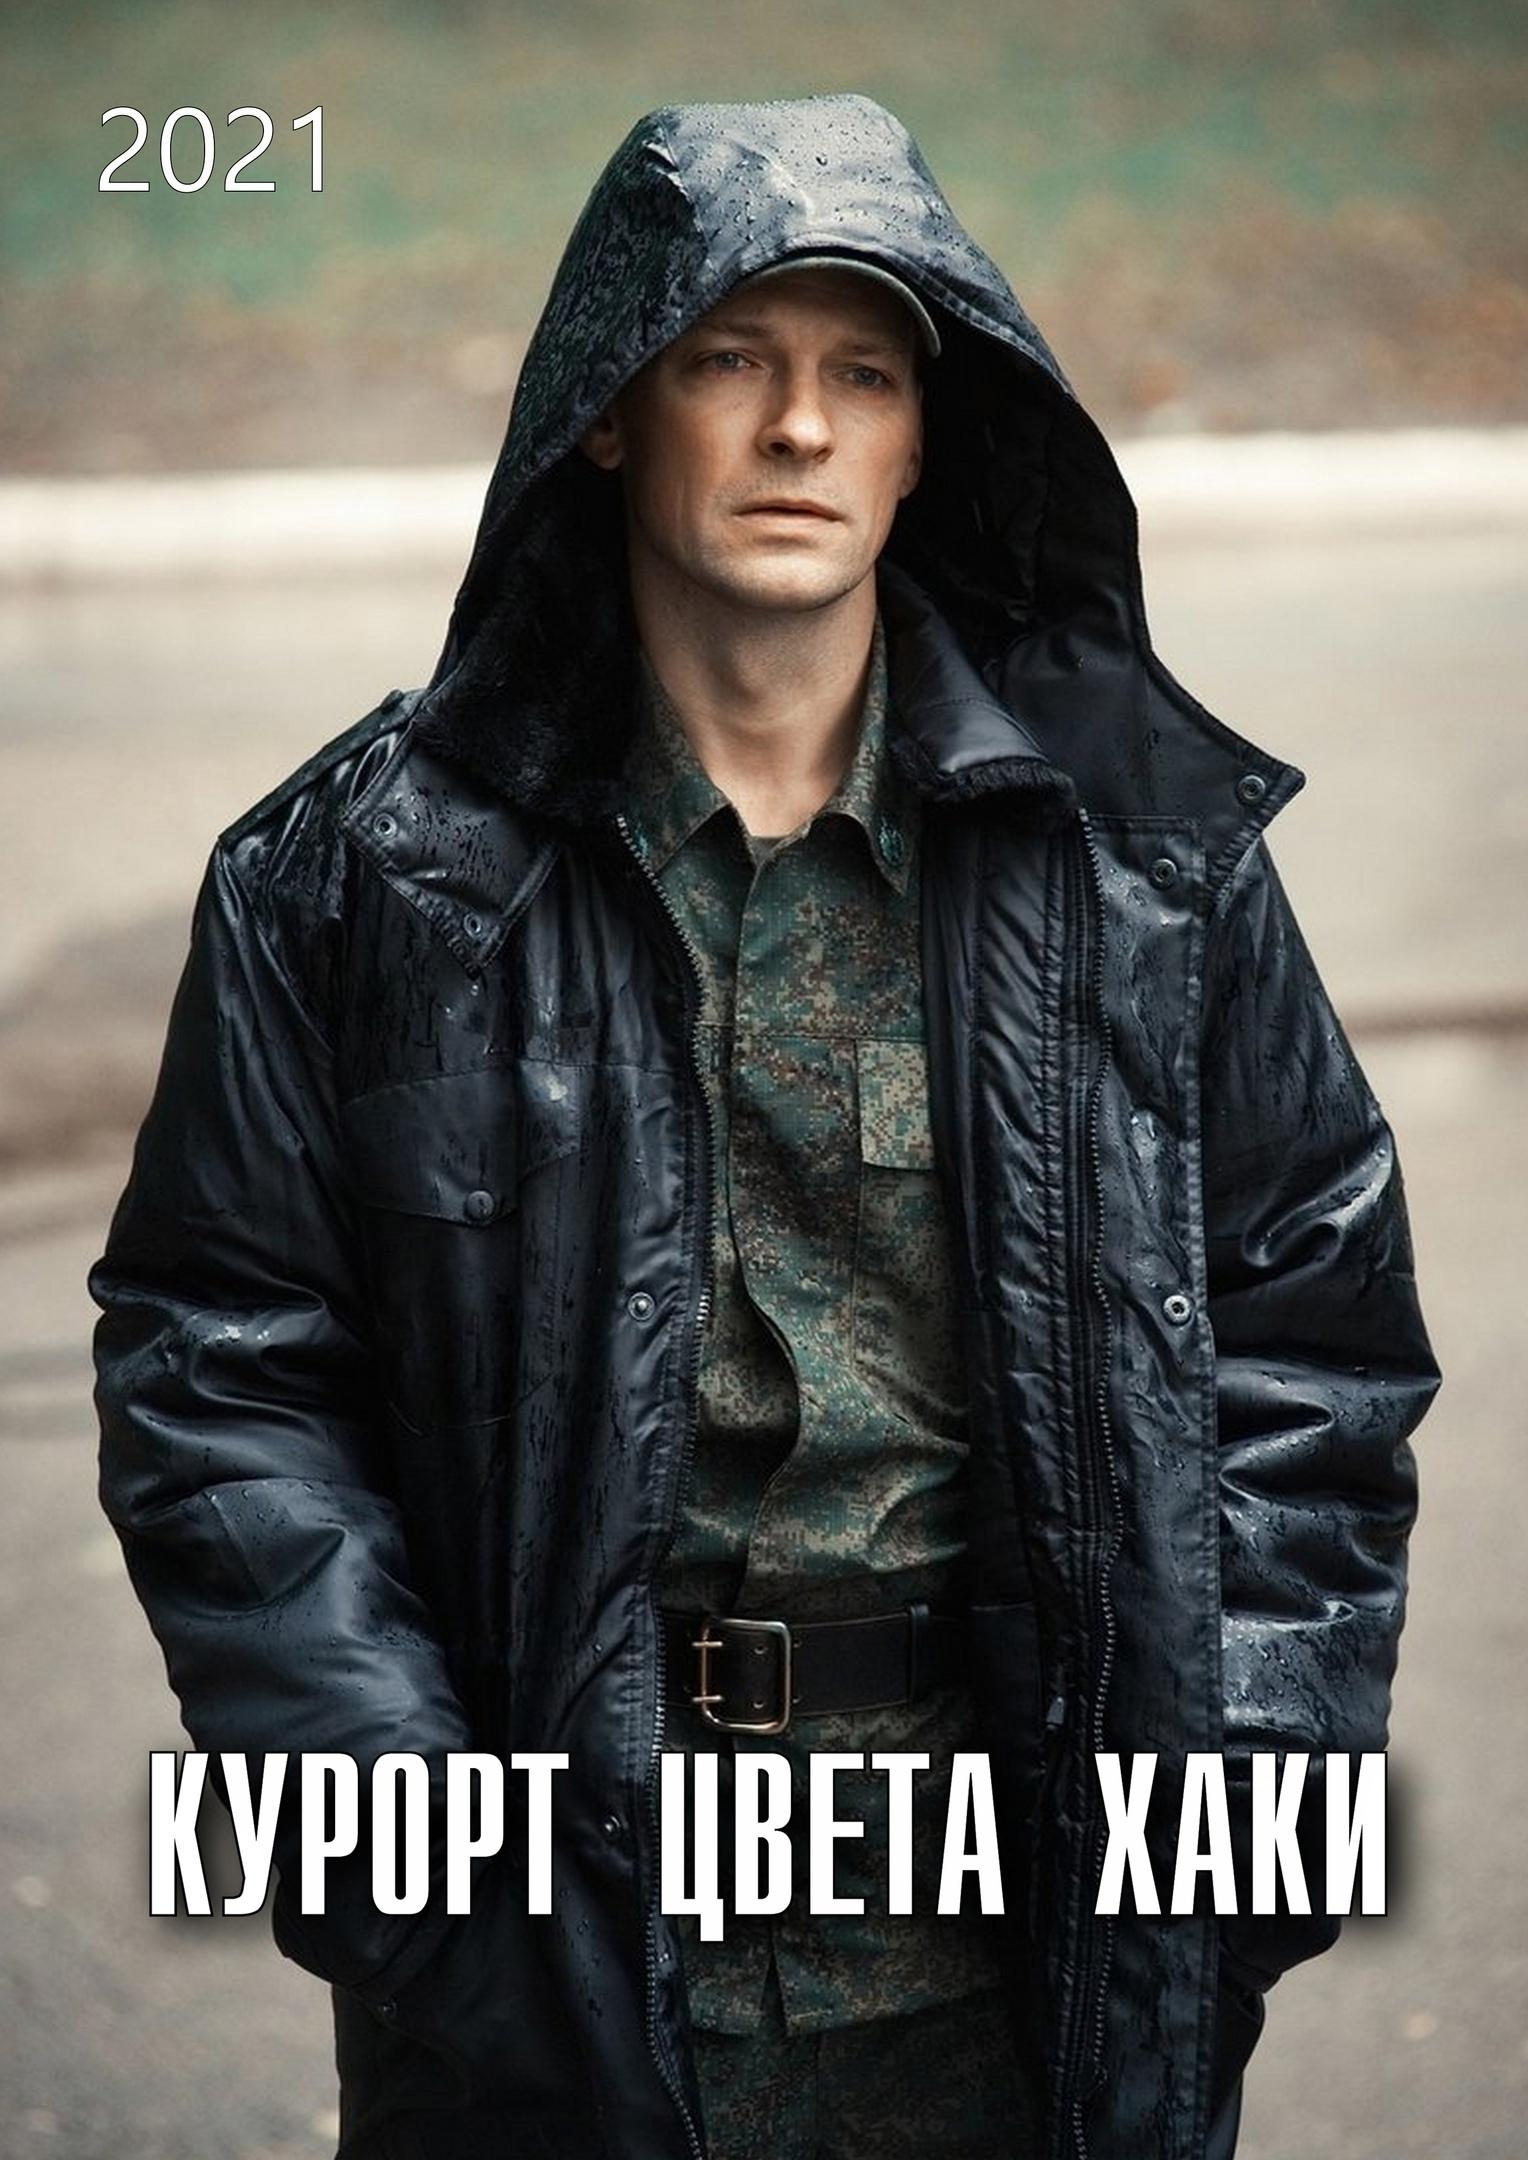 Детектив «Kypopт цвeтa xaки» (2021) 1-8 серия из 8 HD